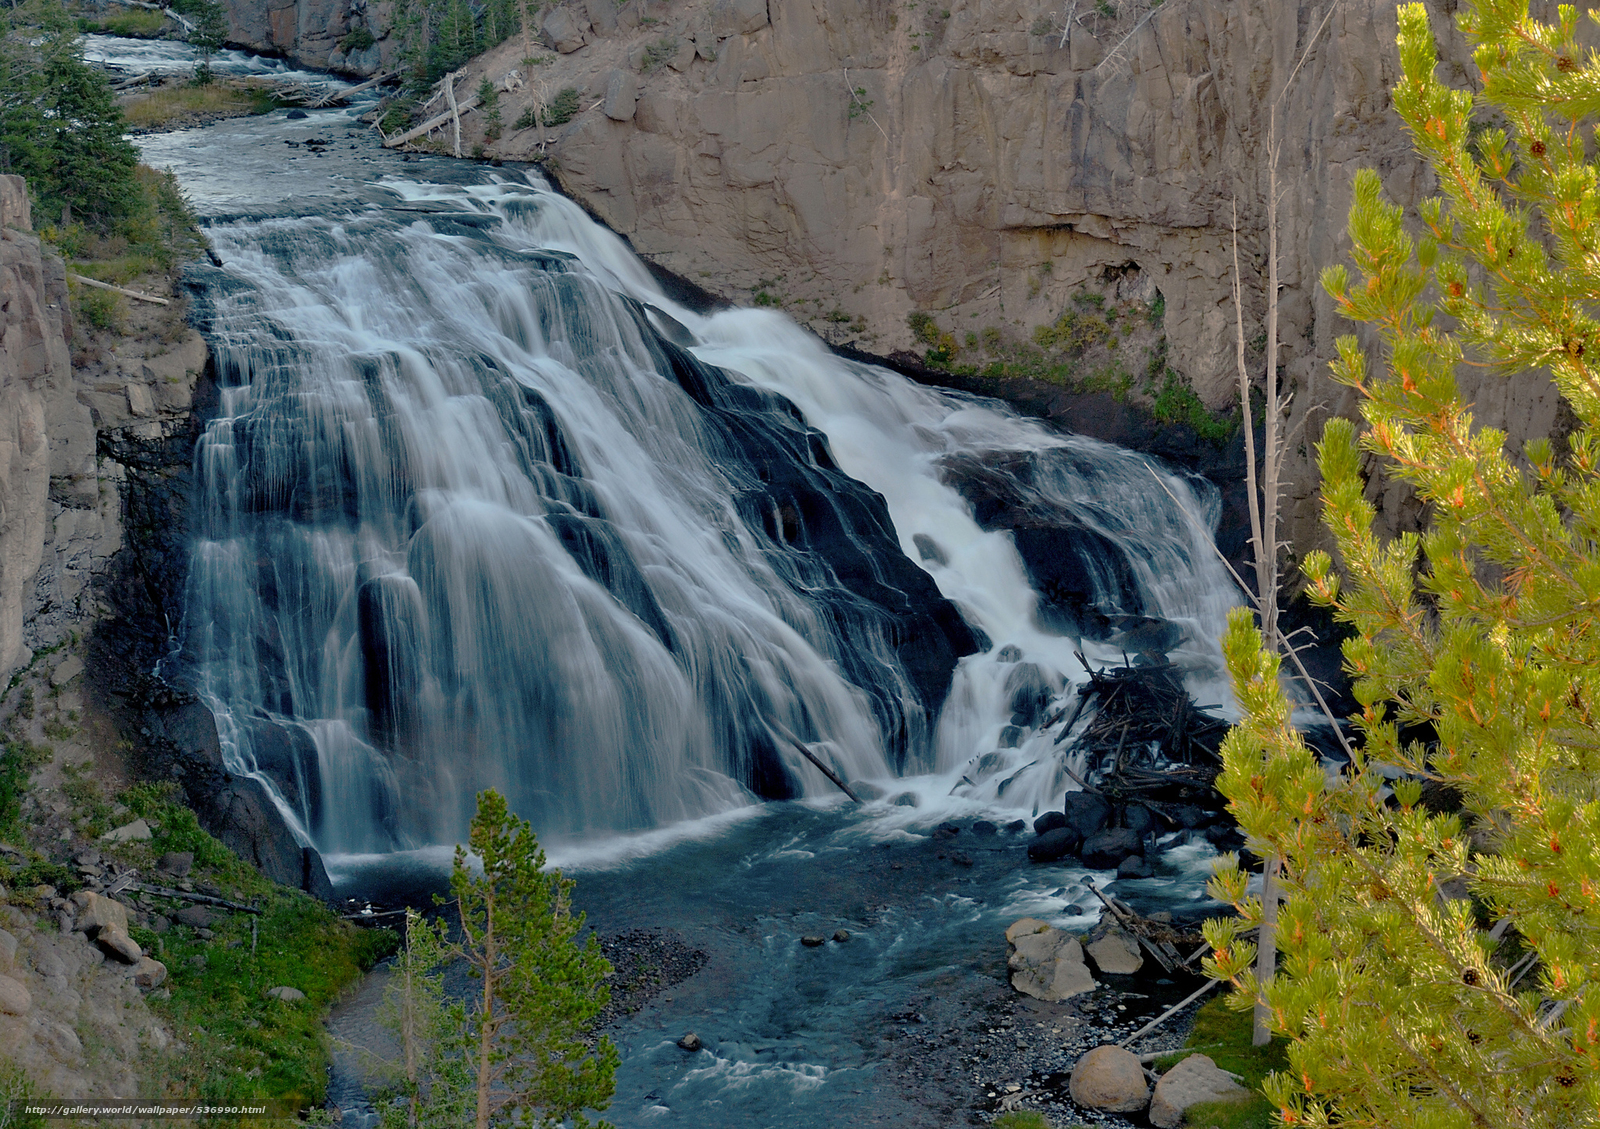 Download wallpaper Show Me The Way Gibbon Falls Yellowstone NP 1600x1129